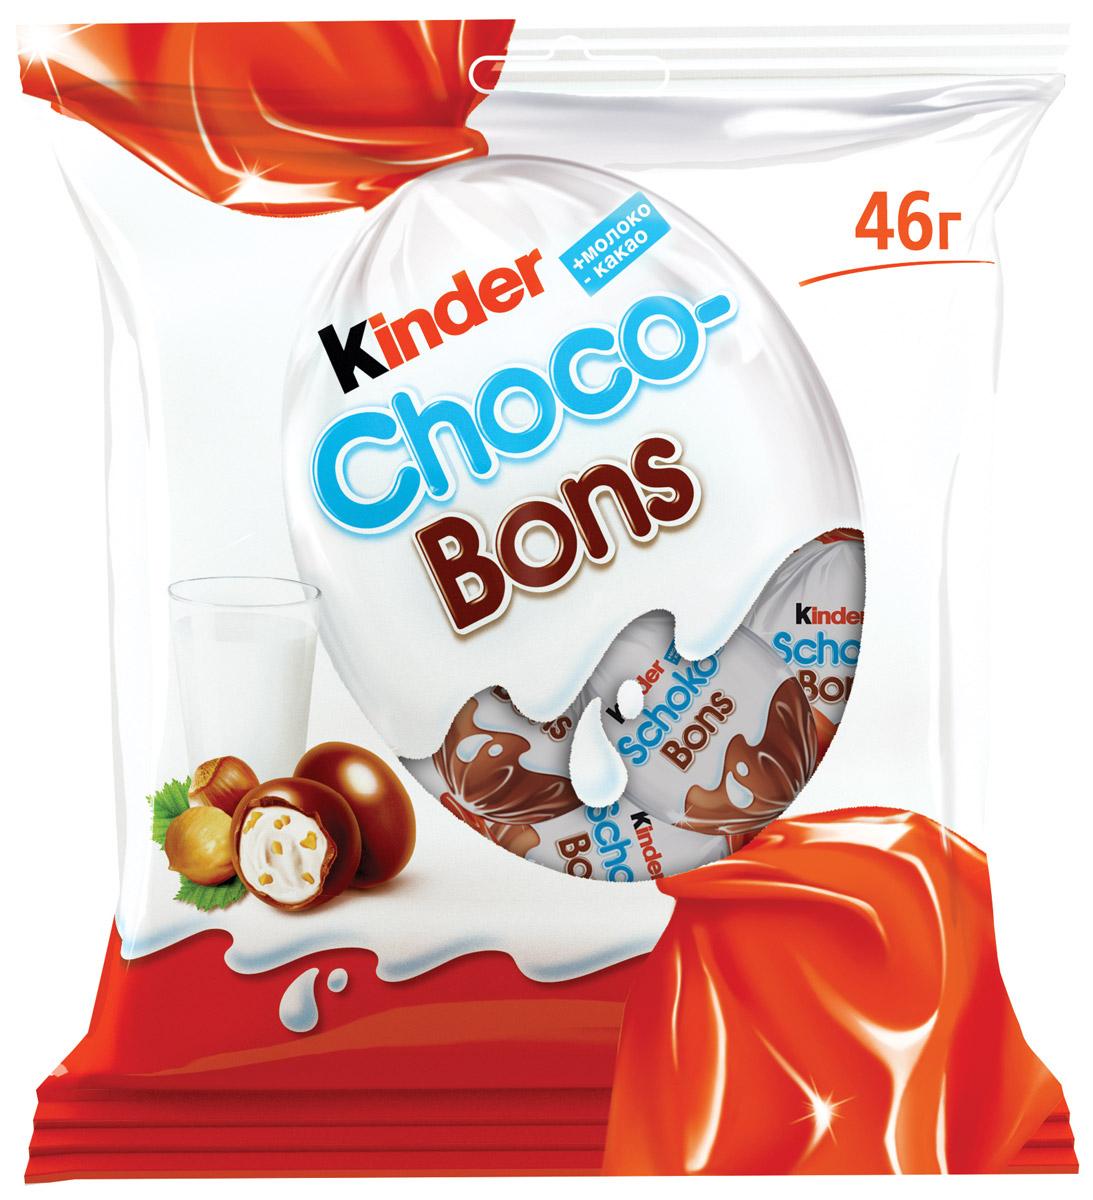 Kinder Choco Bons конфеты из молочного шоколада с молочно-ореховой начинкой, 46 г 77121209/77111794/77111238